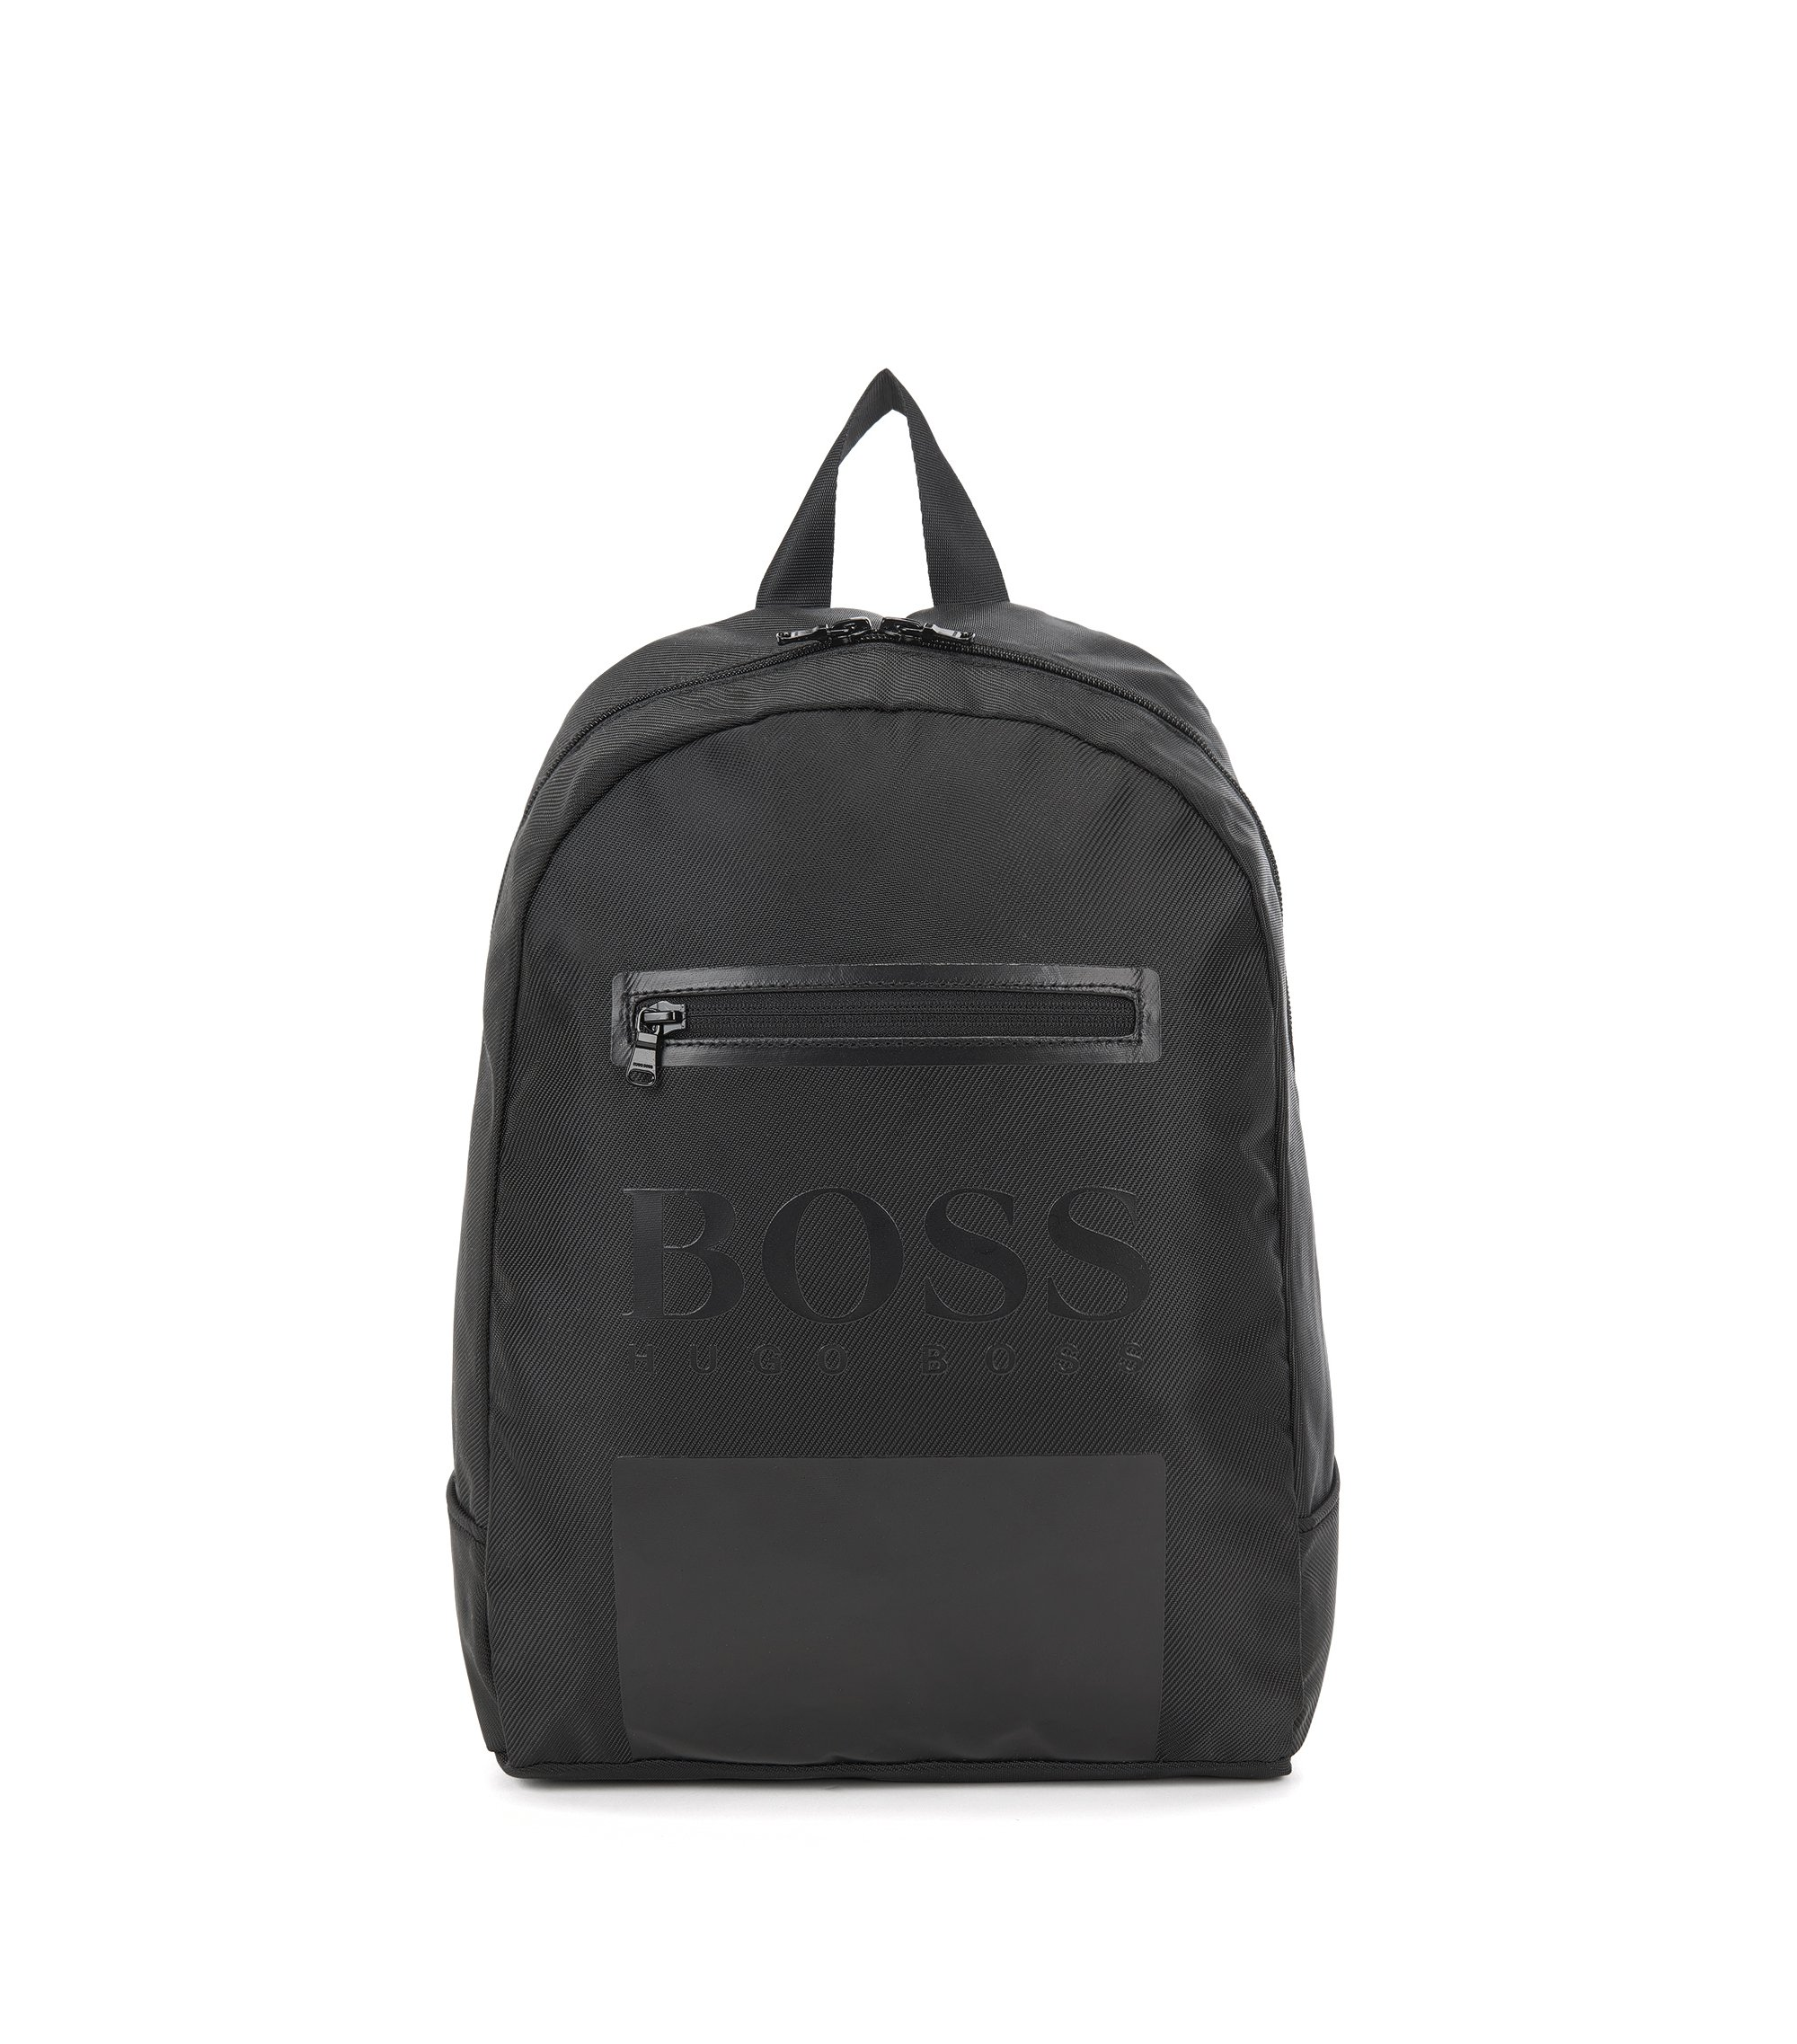 Kids' rucksack in material blend: 'J20200', Black